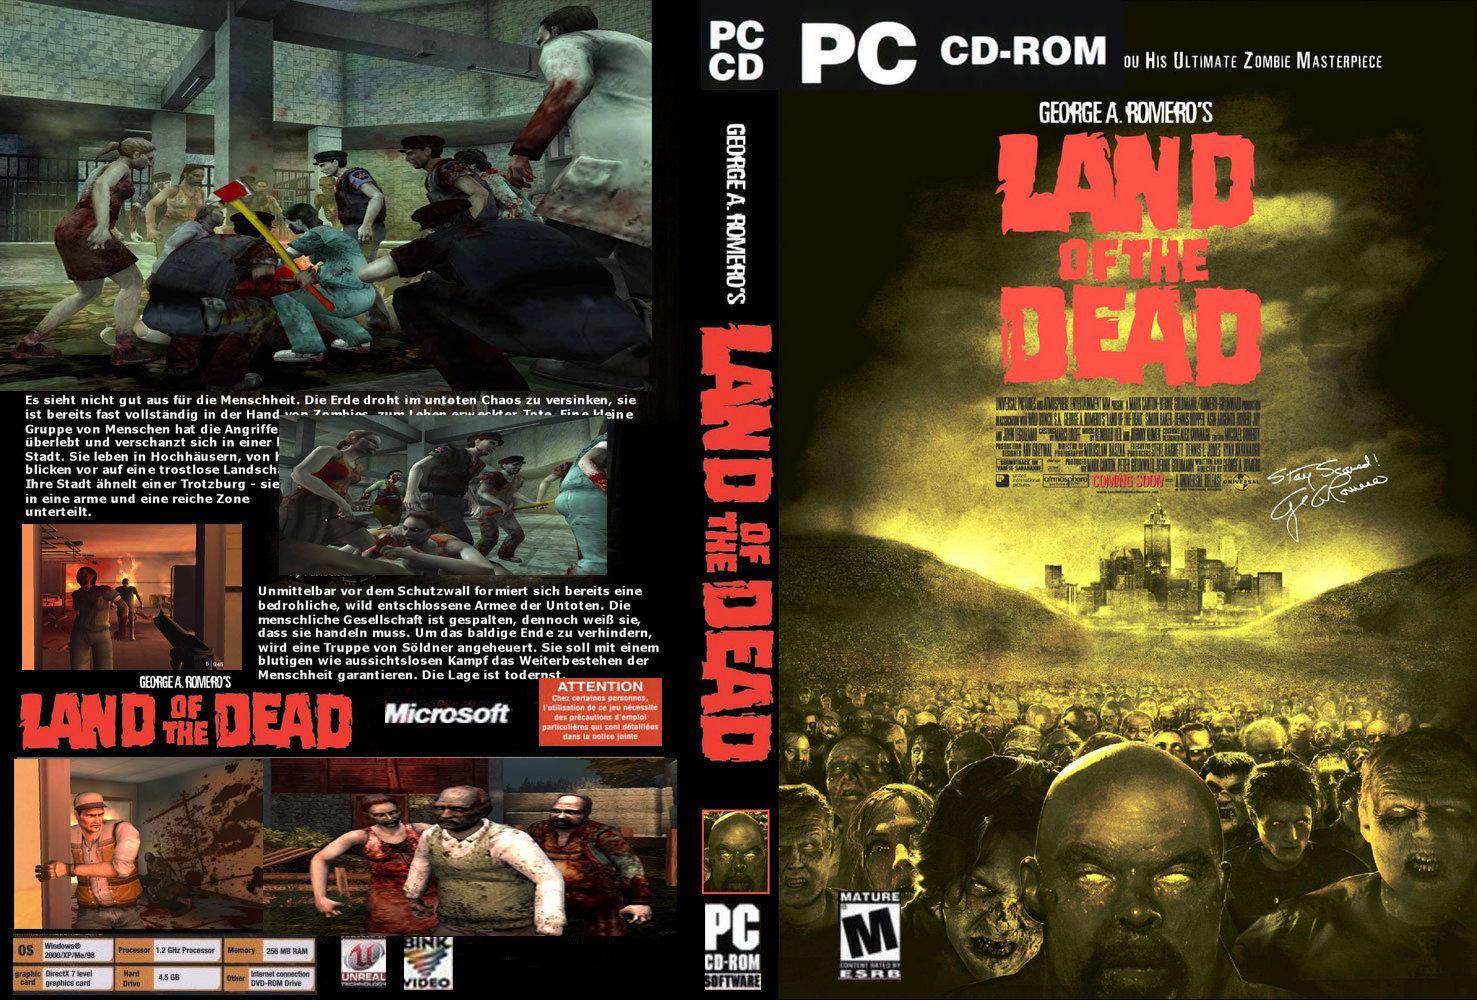 http://2.bp.blogspot.com/--NYSm1Q0N7g/Tl_KZxxWDzI/AAAAAAAAASM/6h6Th0vpIBA/s1600/Land_Of_The_Dead_Road_To_Fiddlers_Green_Dvd-%255Bcdcovers_cc%255D-front%255B1%255D.jpg